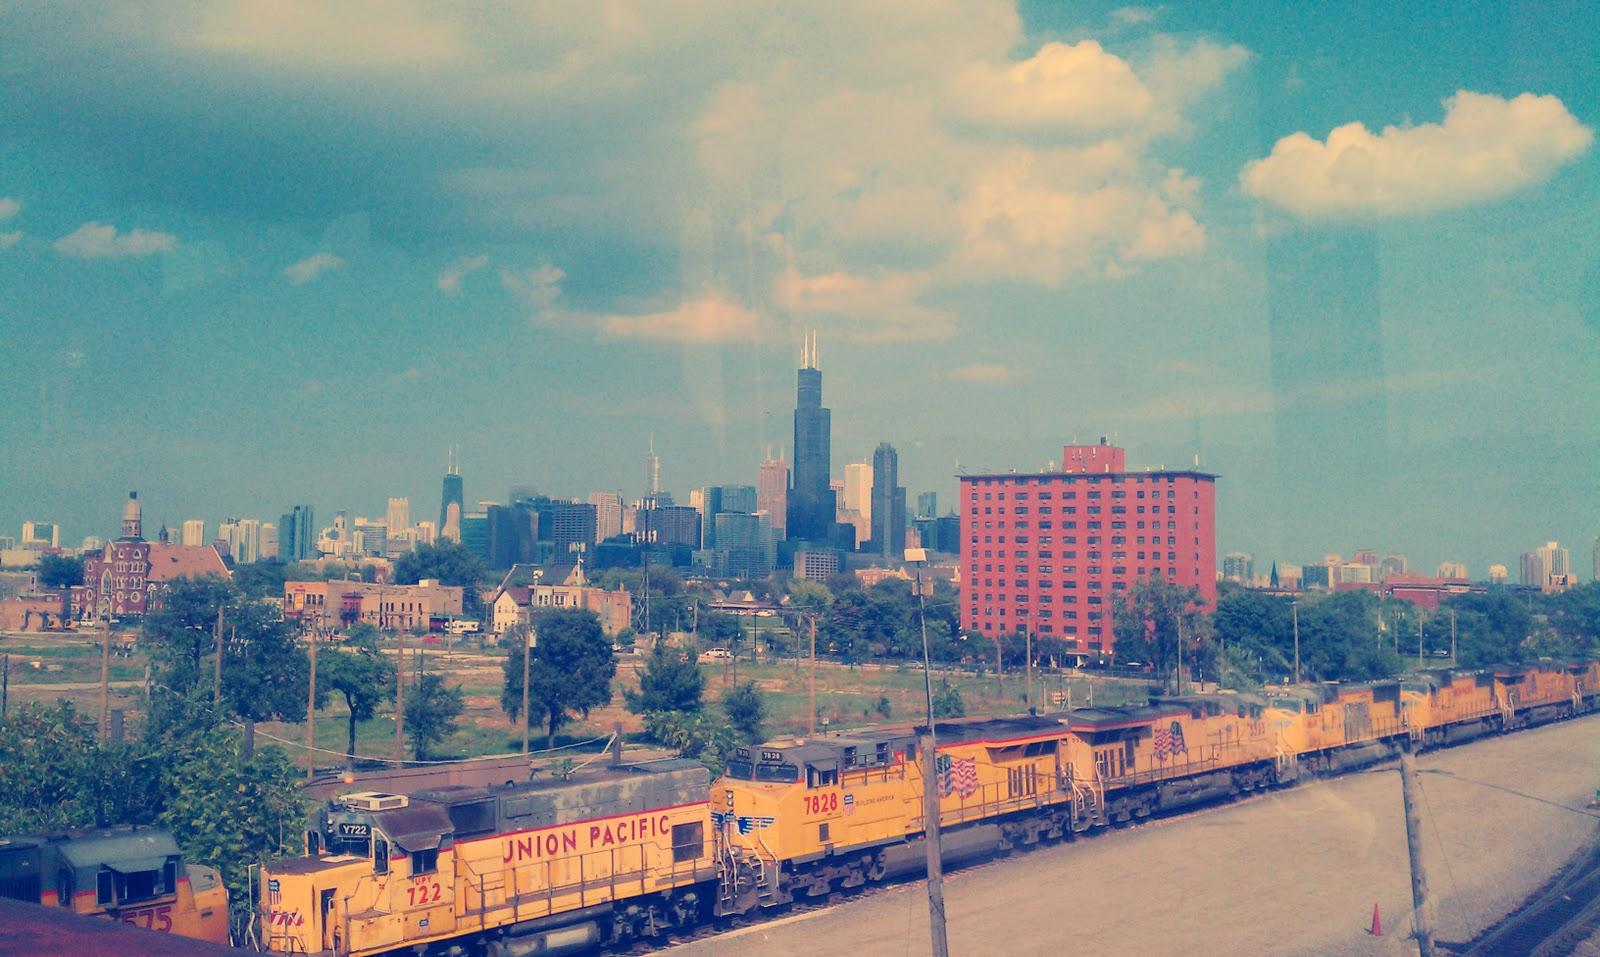 http://1.bp.blogspot.com/-C0iq_JeLQP4/TnqWLEaJ0YI/AAAAAAAAAg4/exngNGZFirE/s1600/2011_Chicago_train.jpg